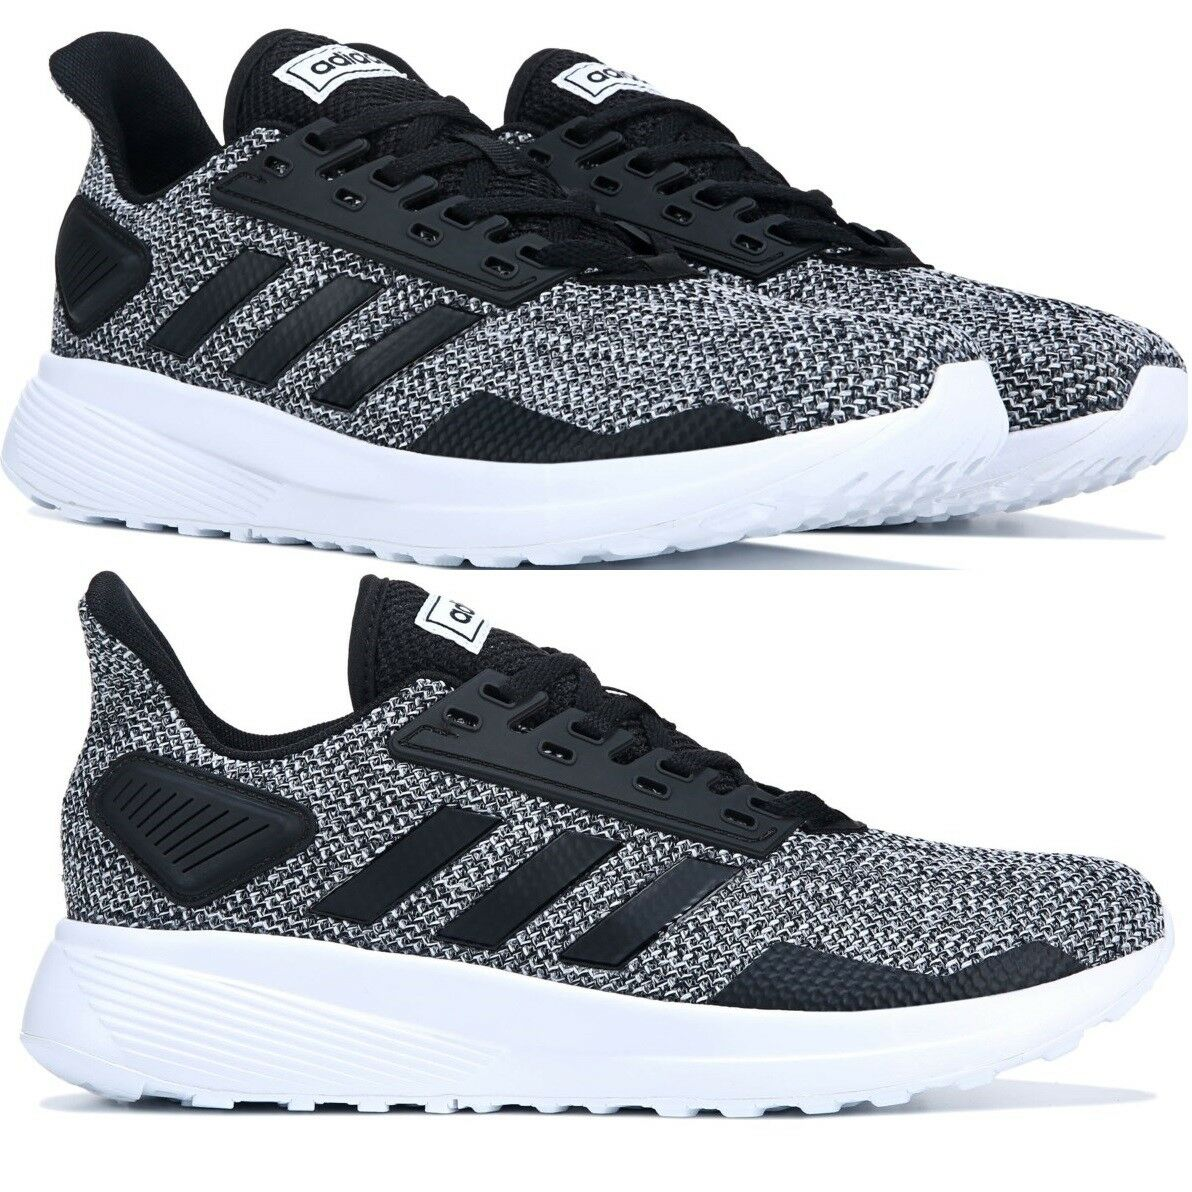 Adidas Duramo 9 Running Men's Comfy shoes Lifestyle Sneakers D Medium 4E X-Wide